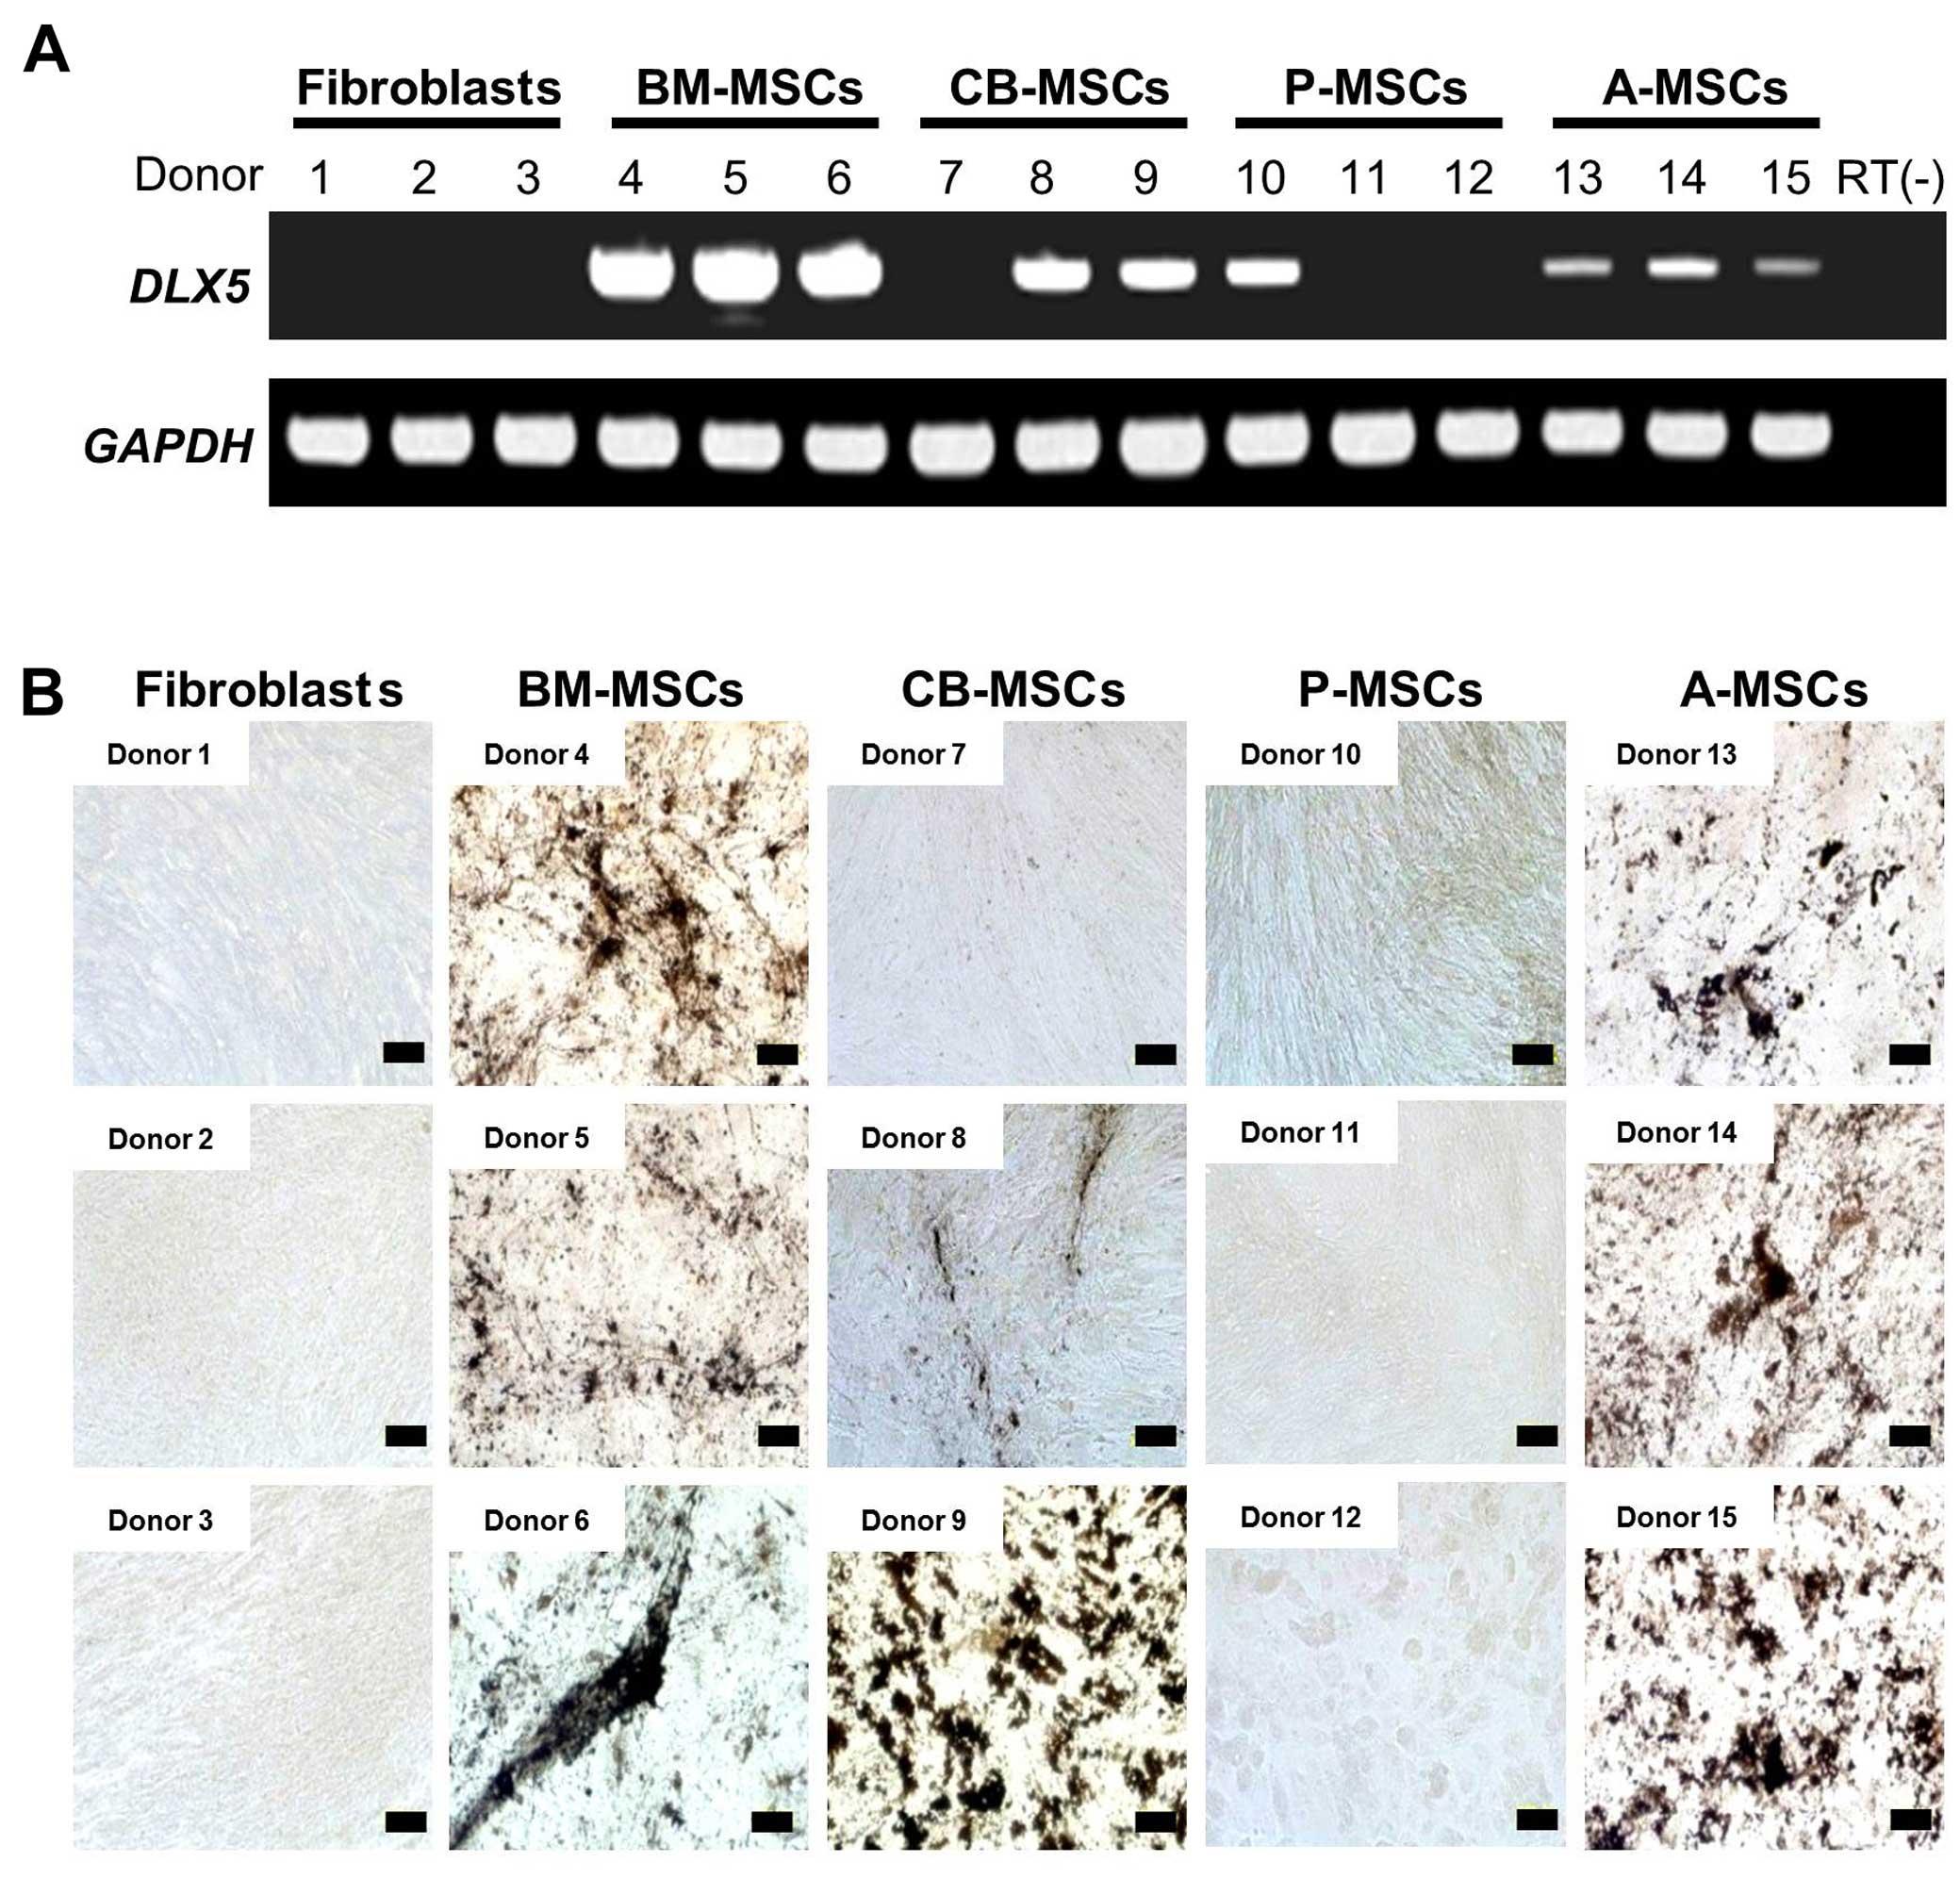 Comparison of molecular profiles of human mesenchymal stem